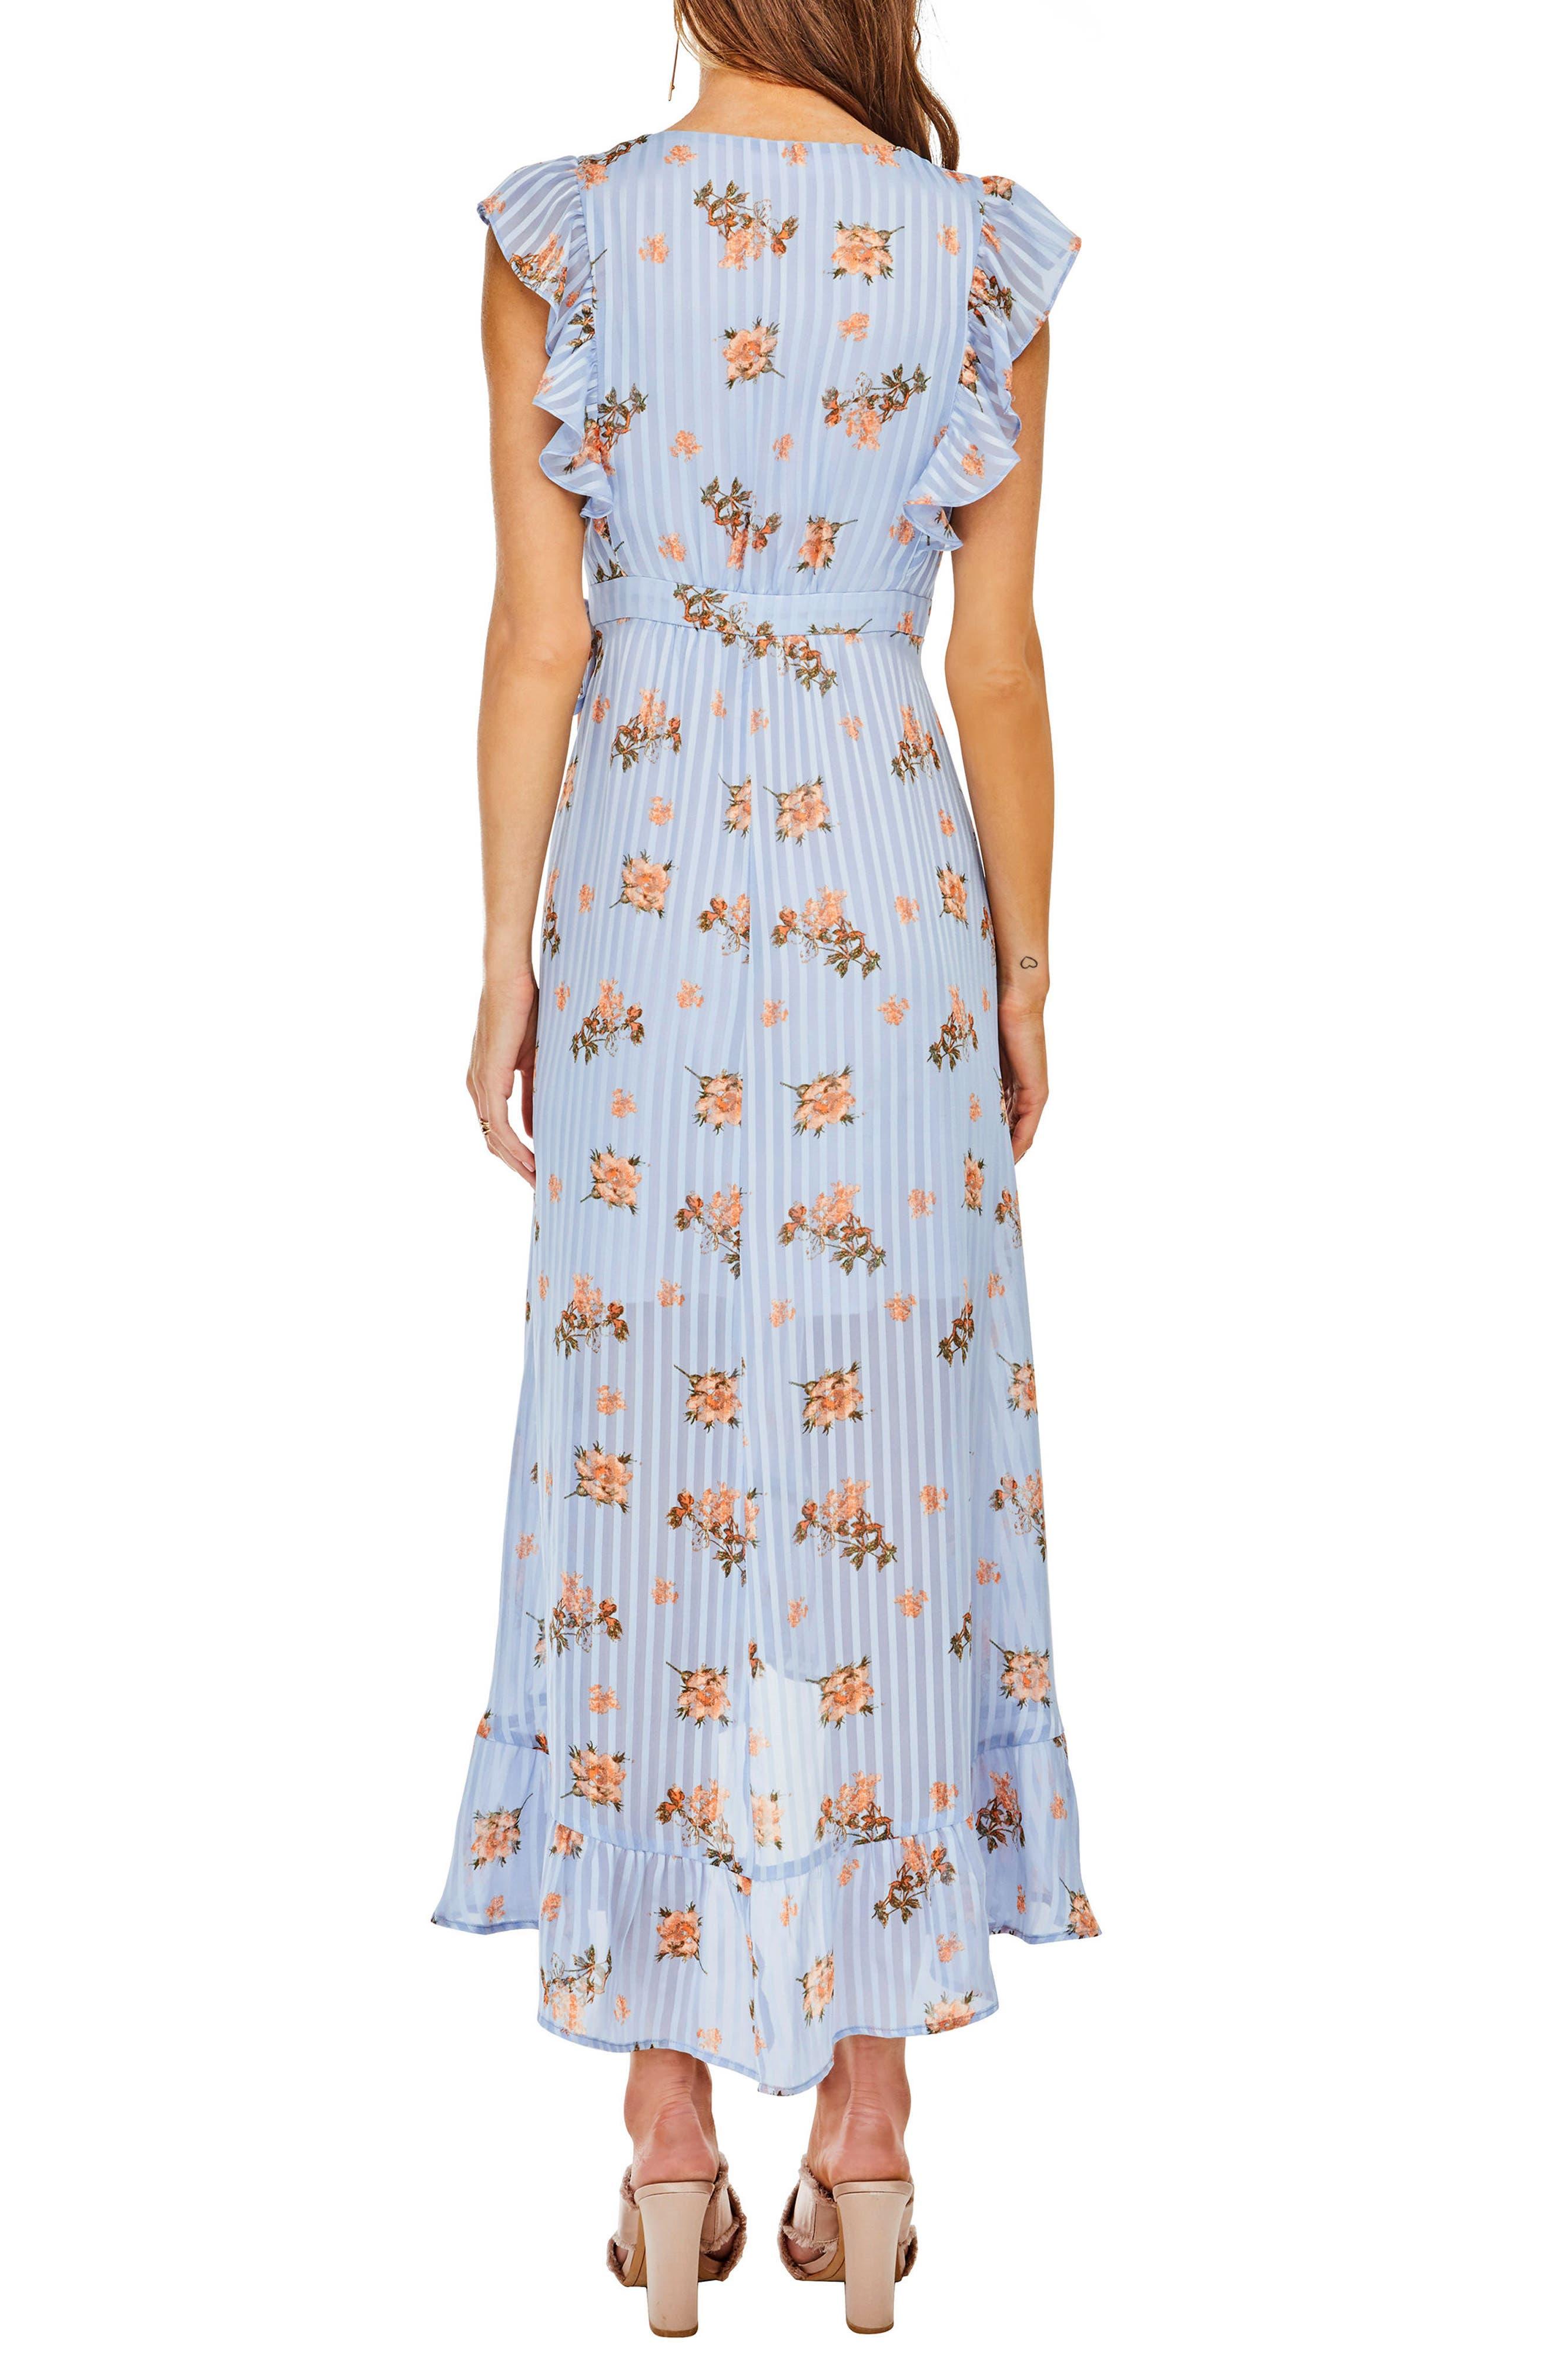 Lila Midi Dress,                             Alternate thumbnail 4, color,                             Blue/Peach Floral